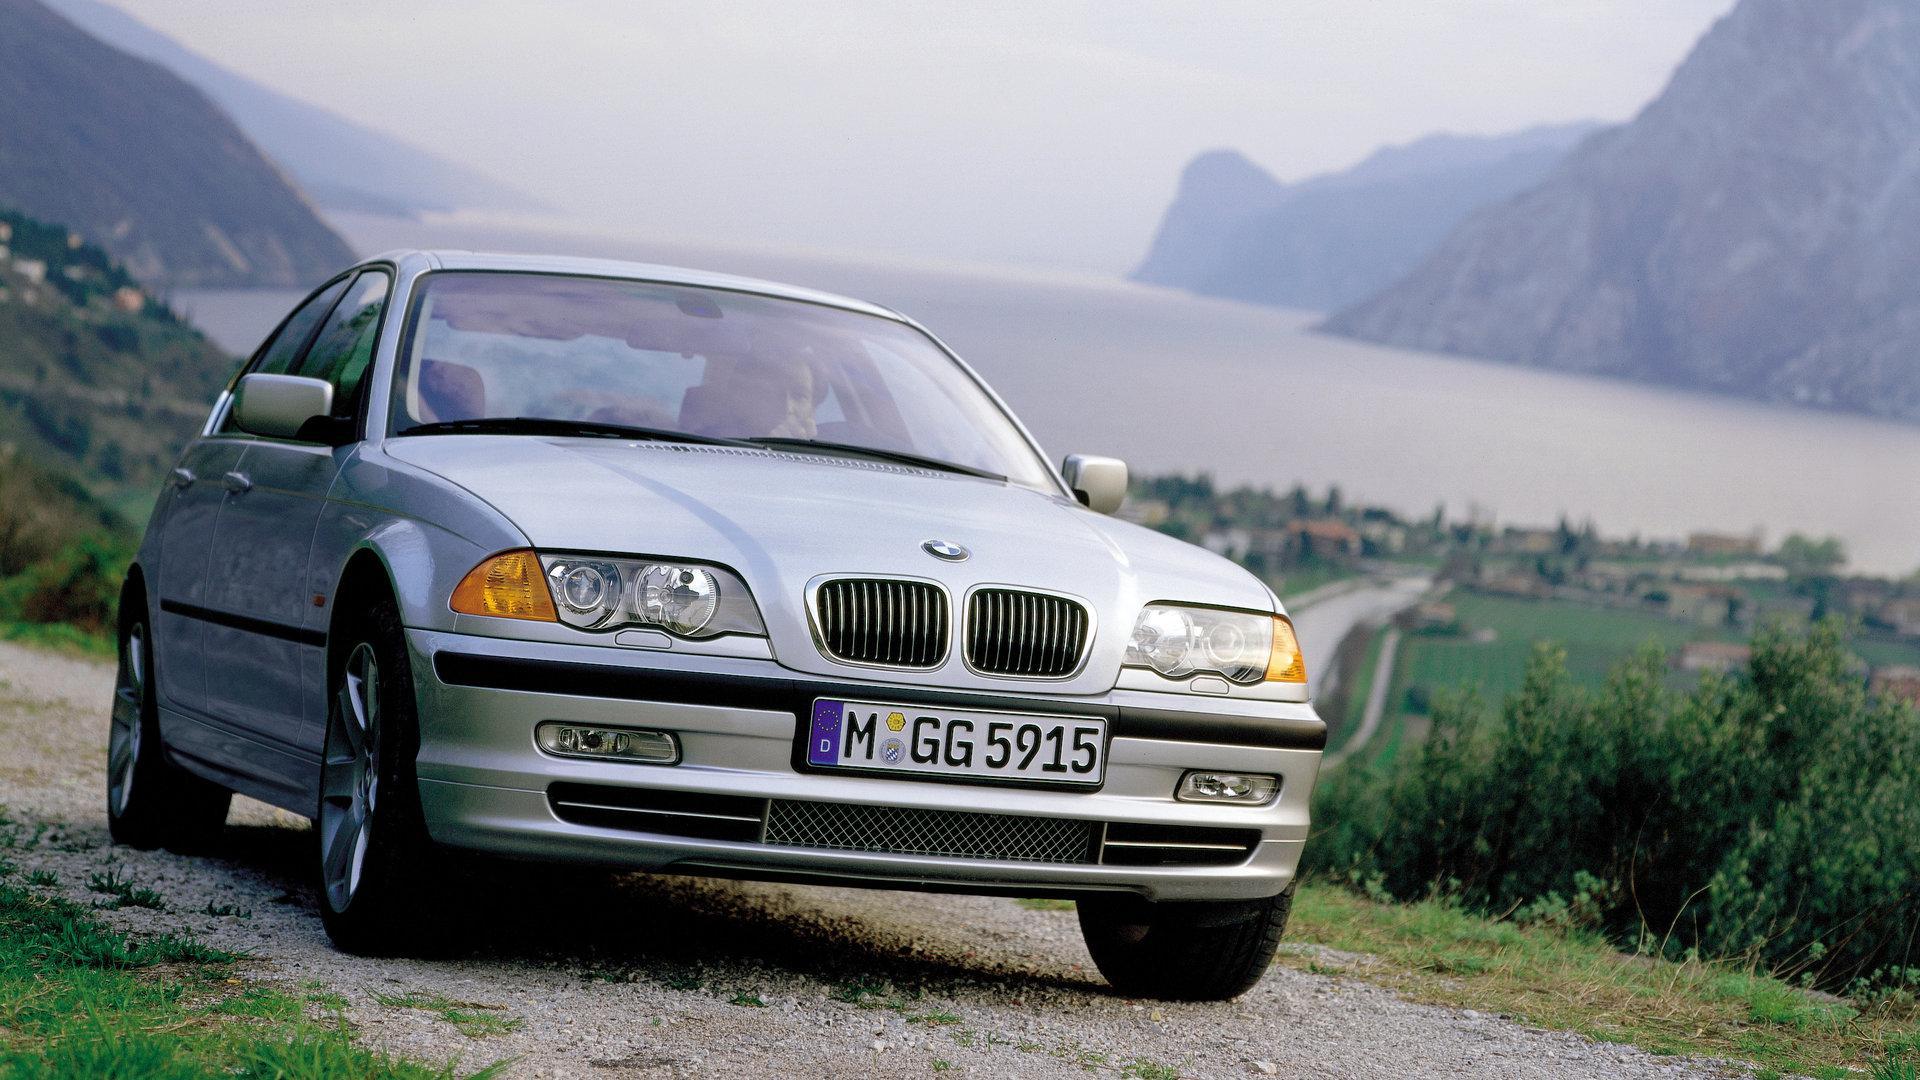 Coche del día: BMW 330i (E46)